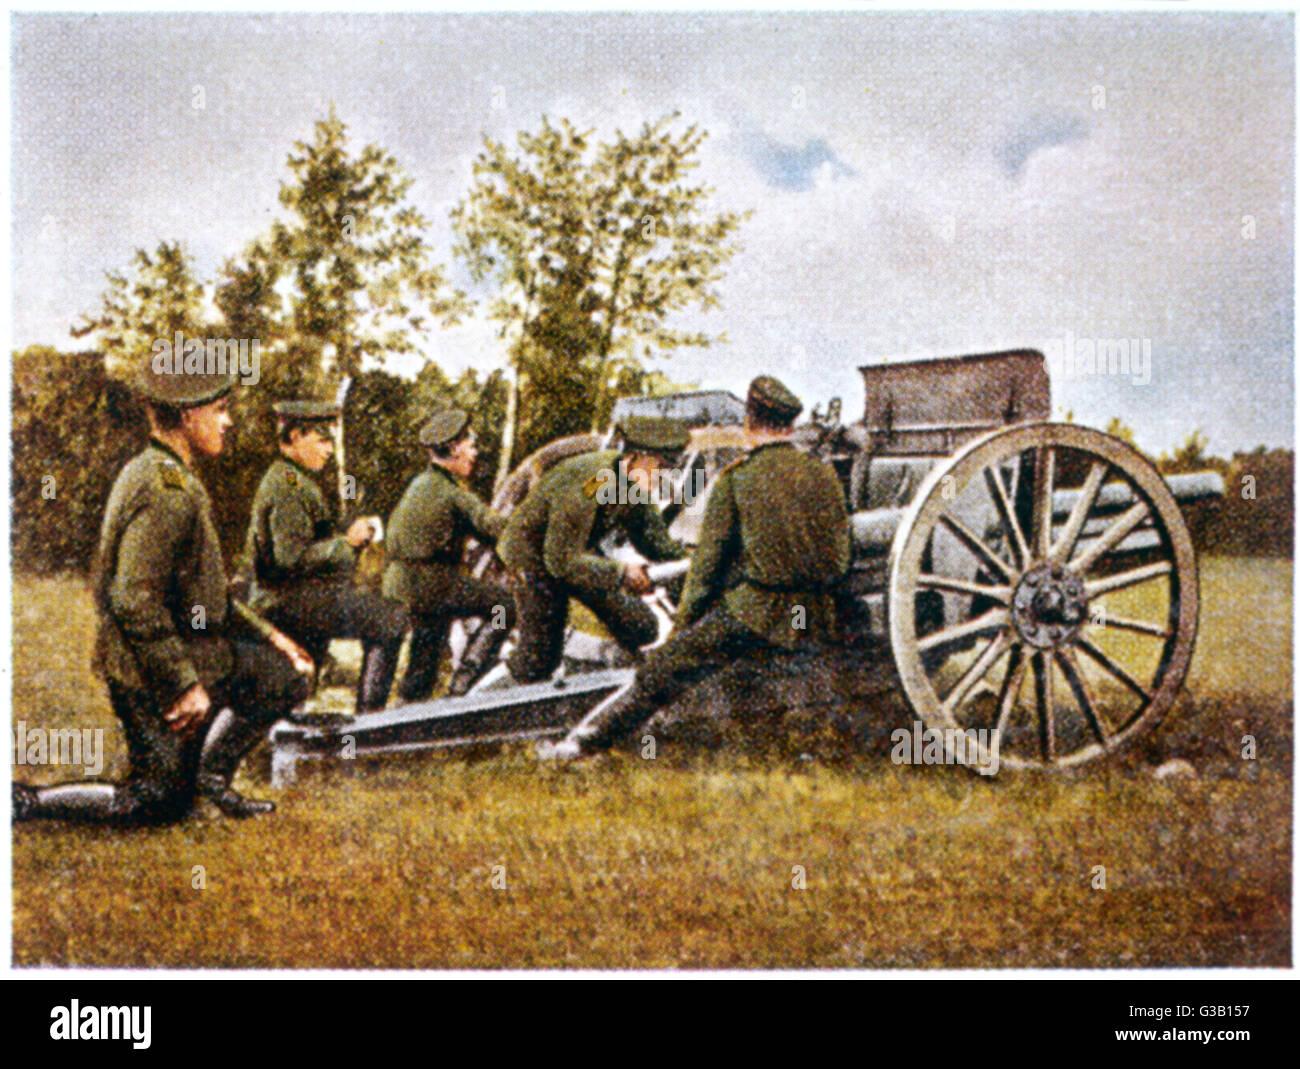 Russian artillery during the First World War        Date: 1914 - Stock Image